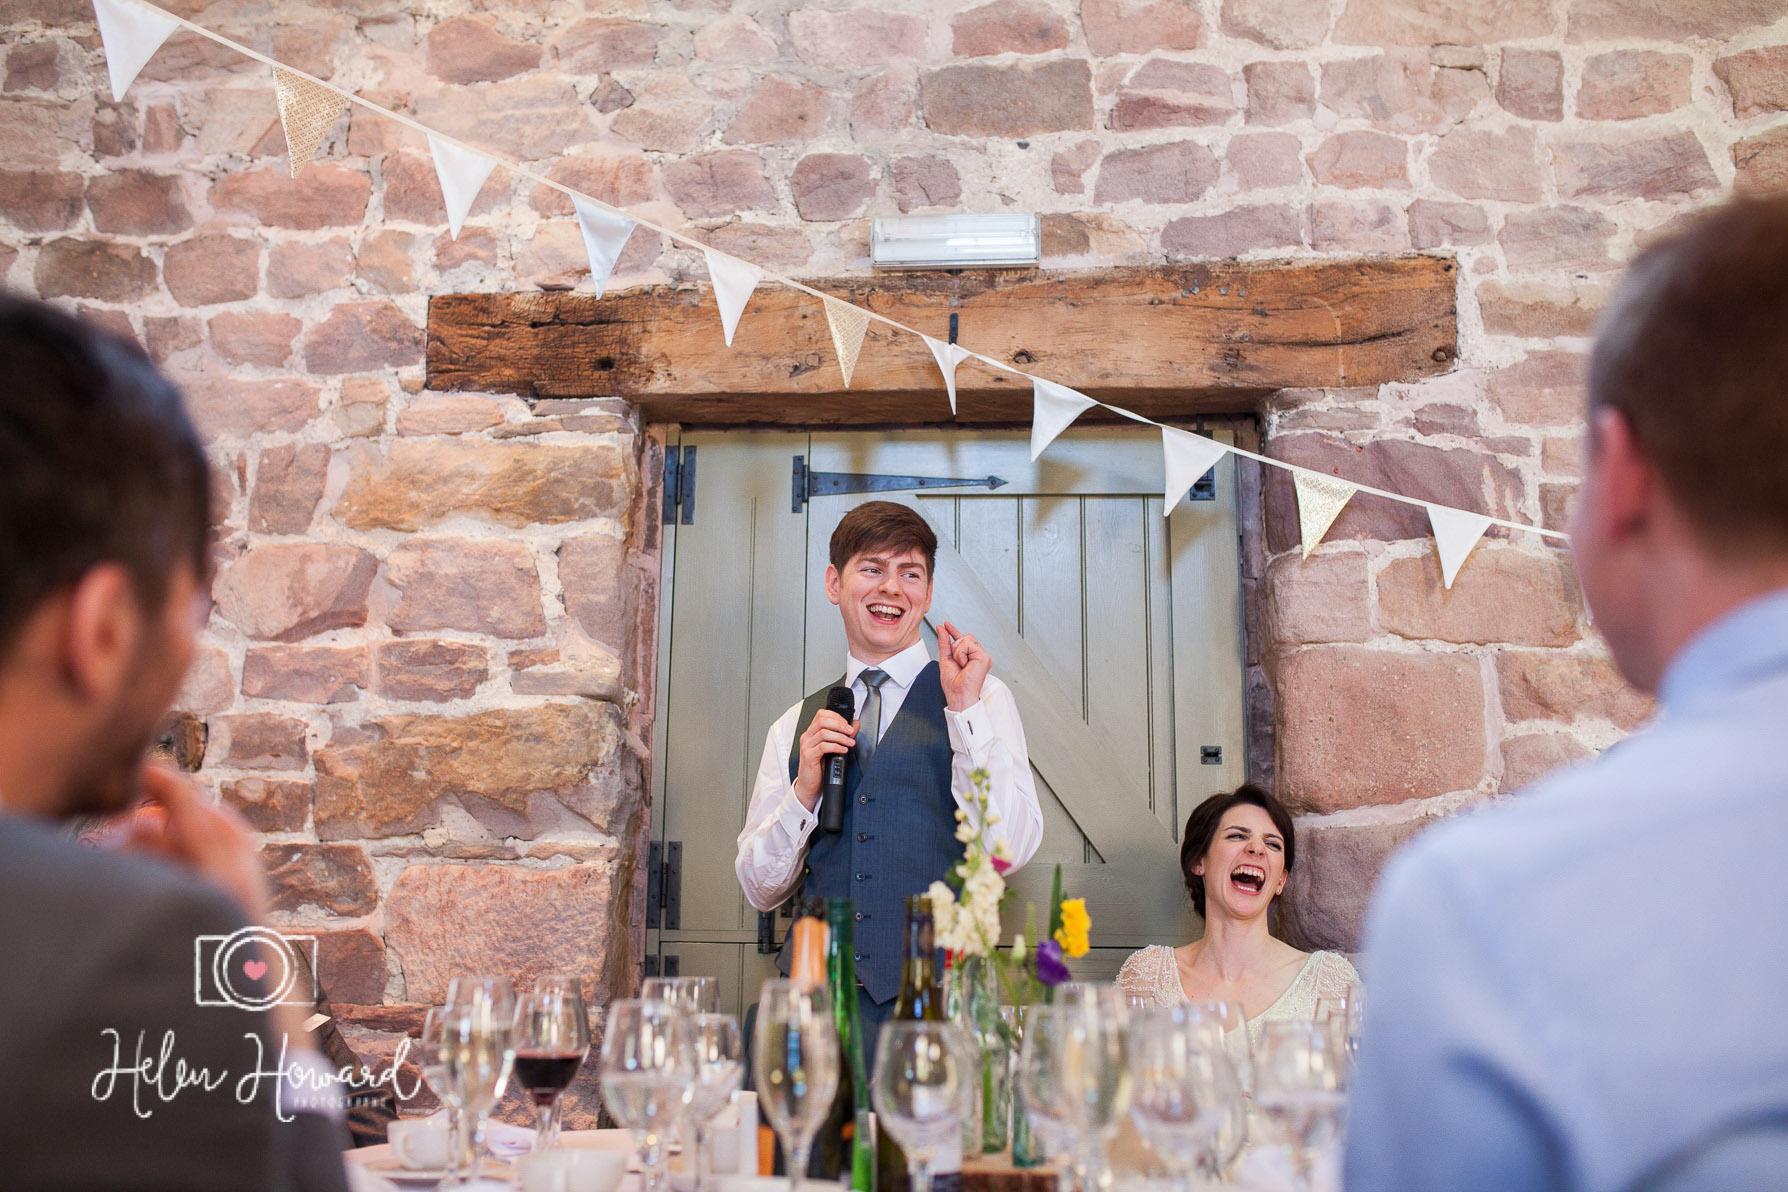 Groom's speech staffordshire wedding photographer